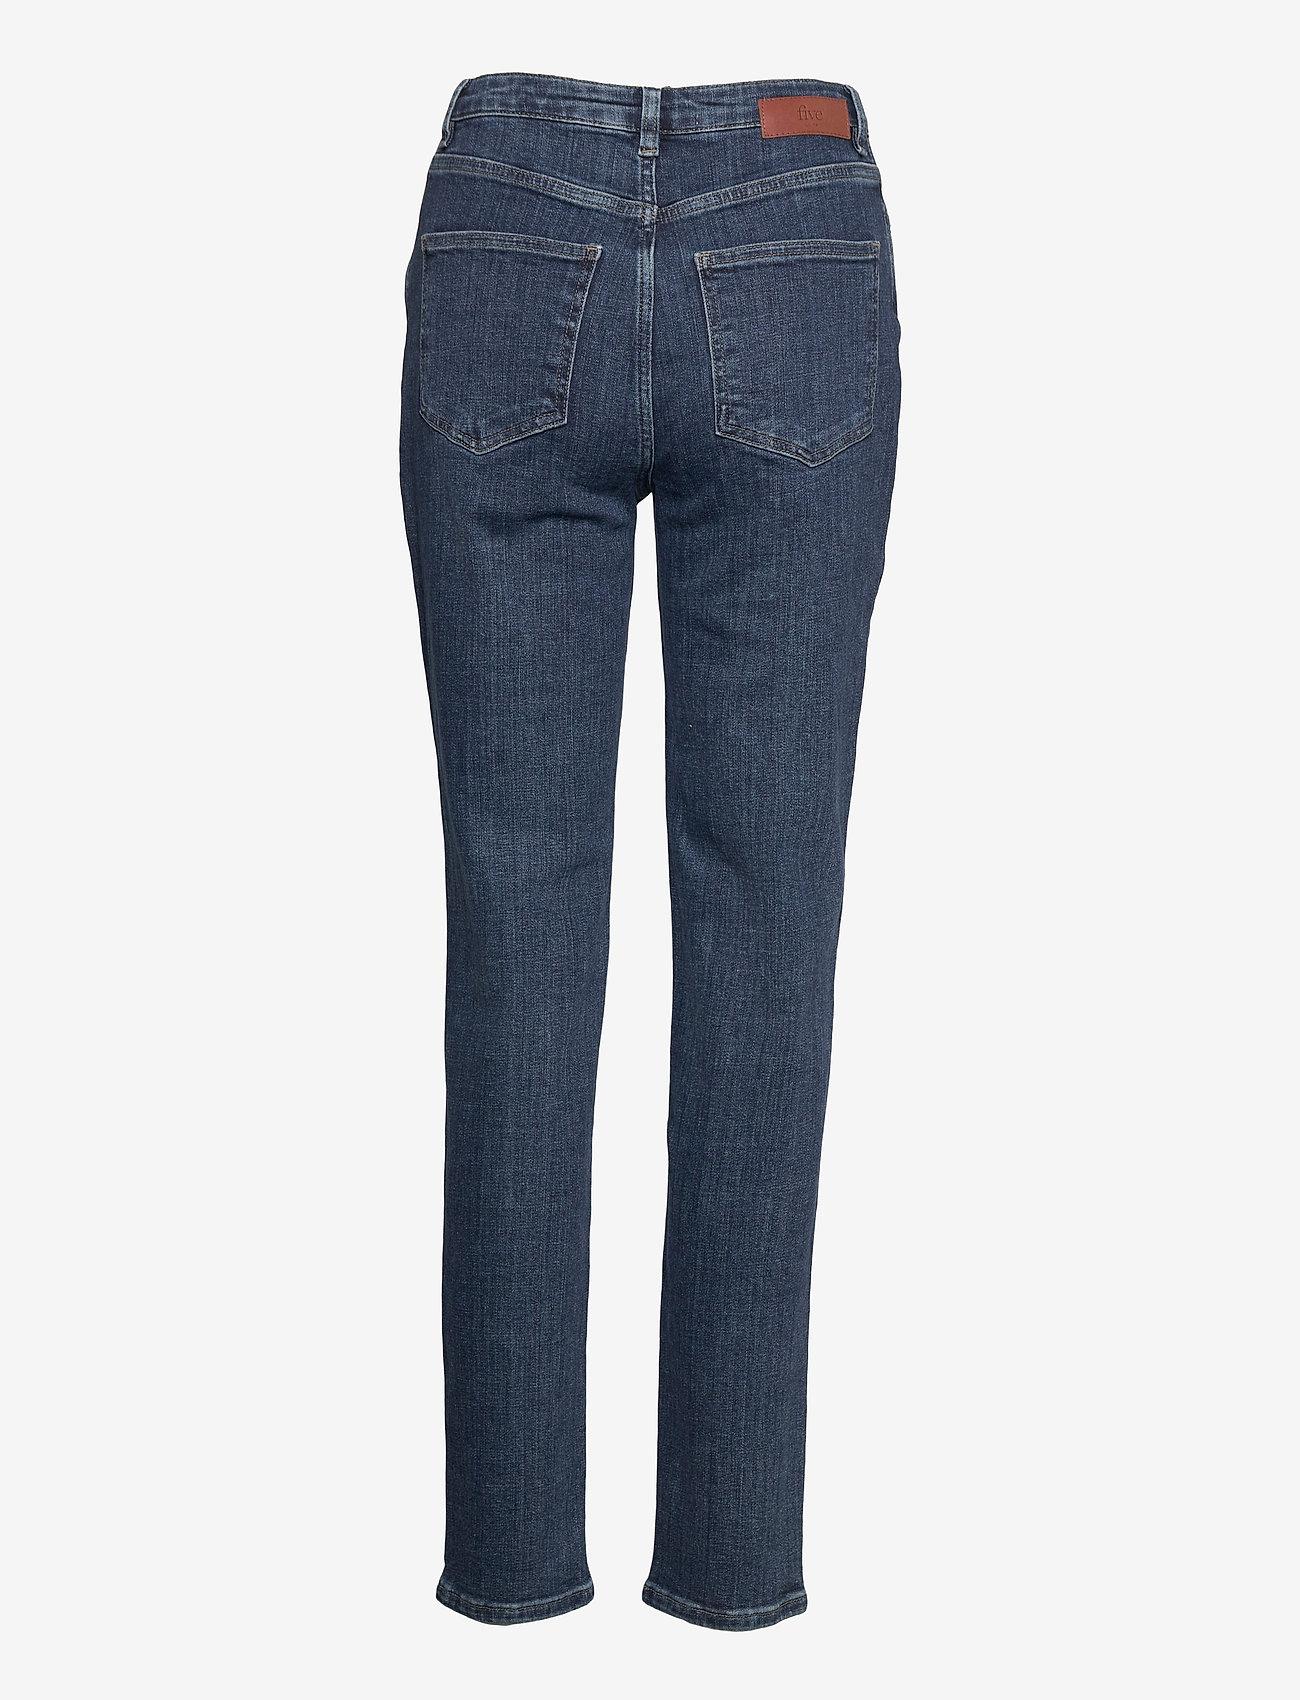 FIVEUNITS - Katelyn 241 - raka jeans - illusion blue auto - 1